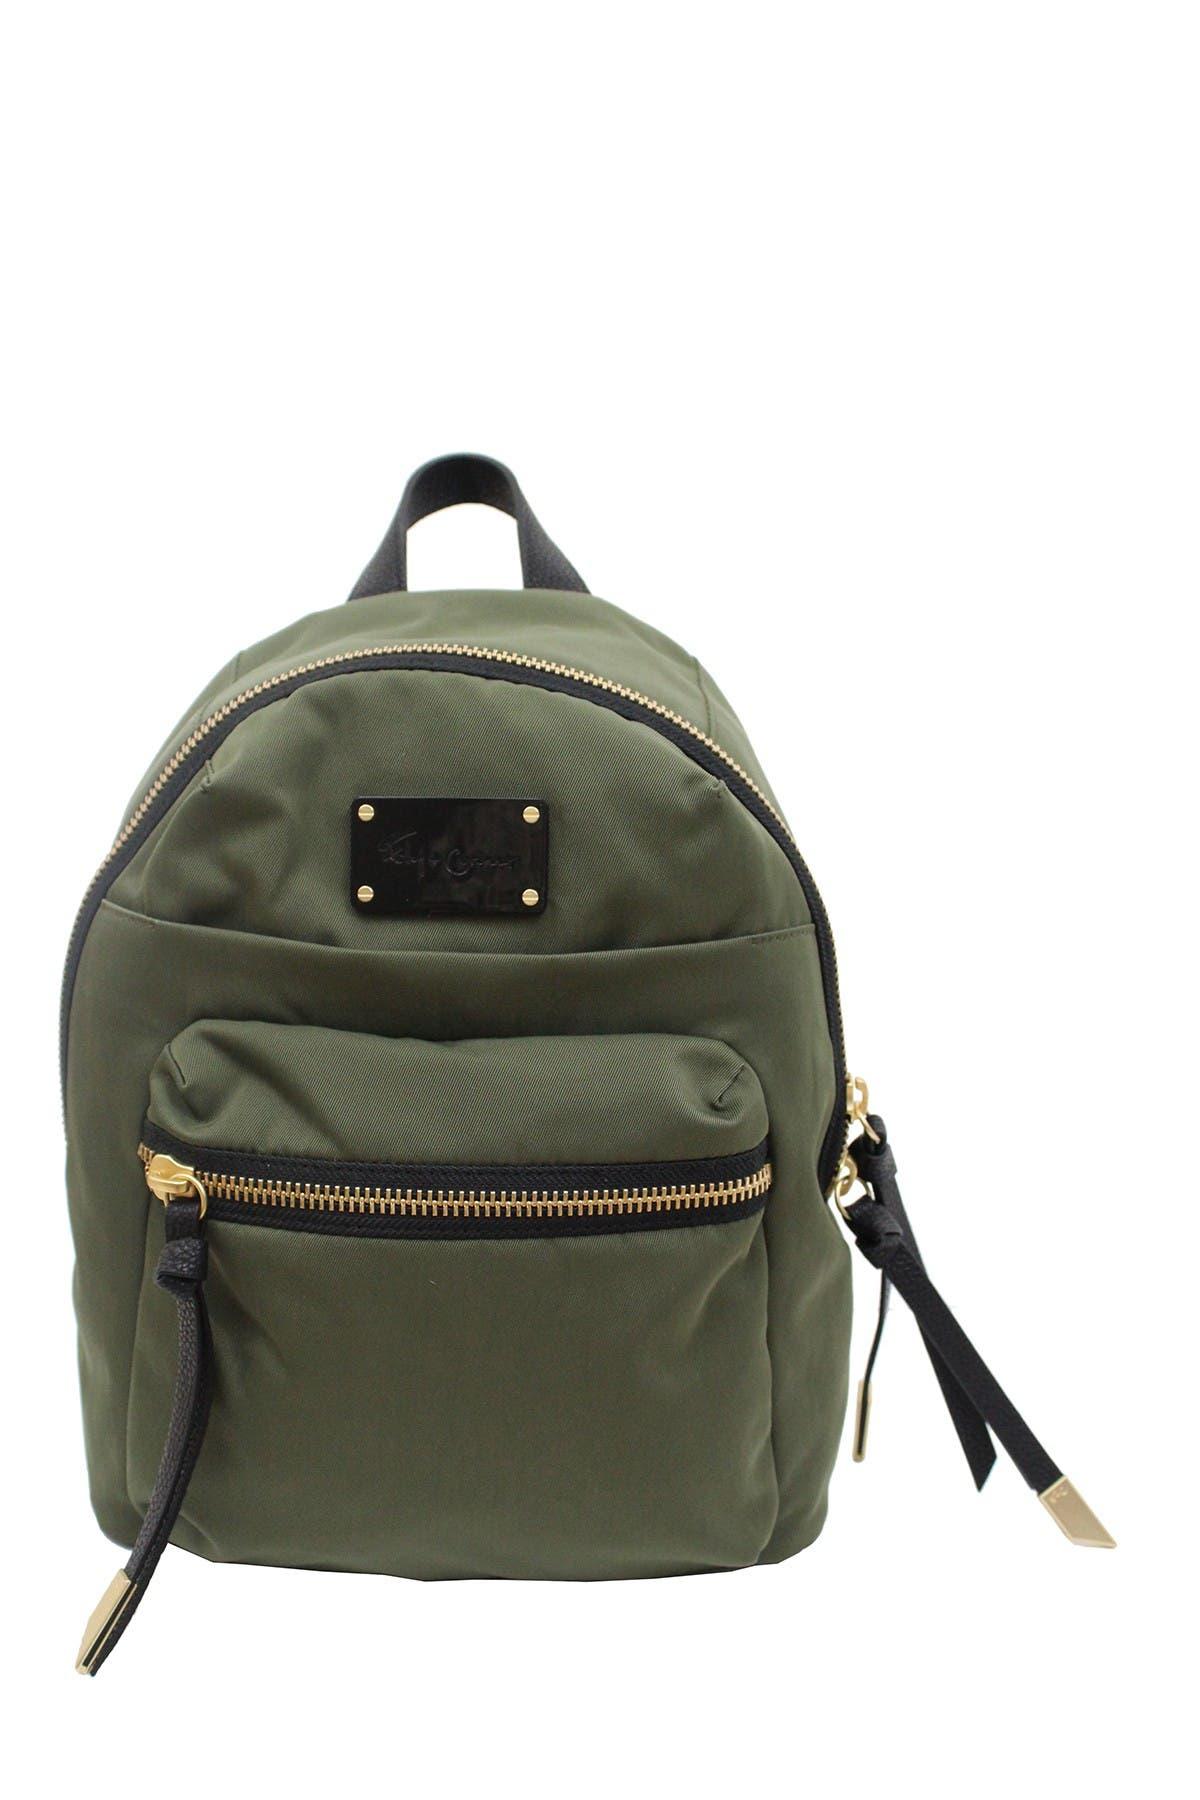 Image of Foley & Corinna Nylon Backpack